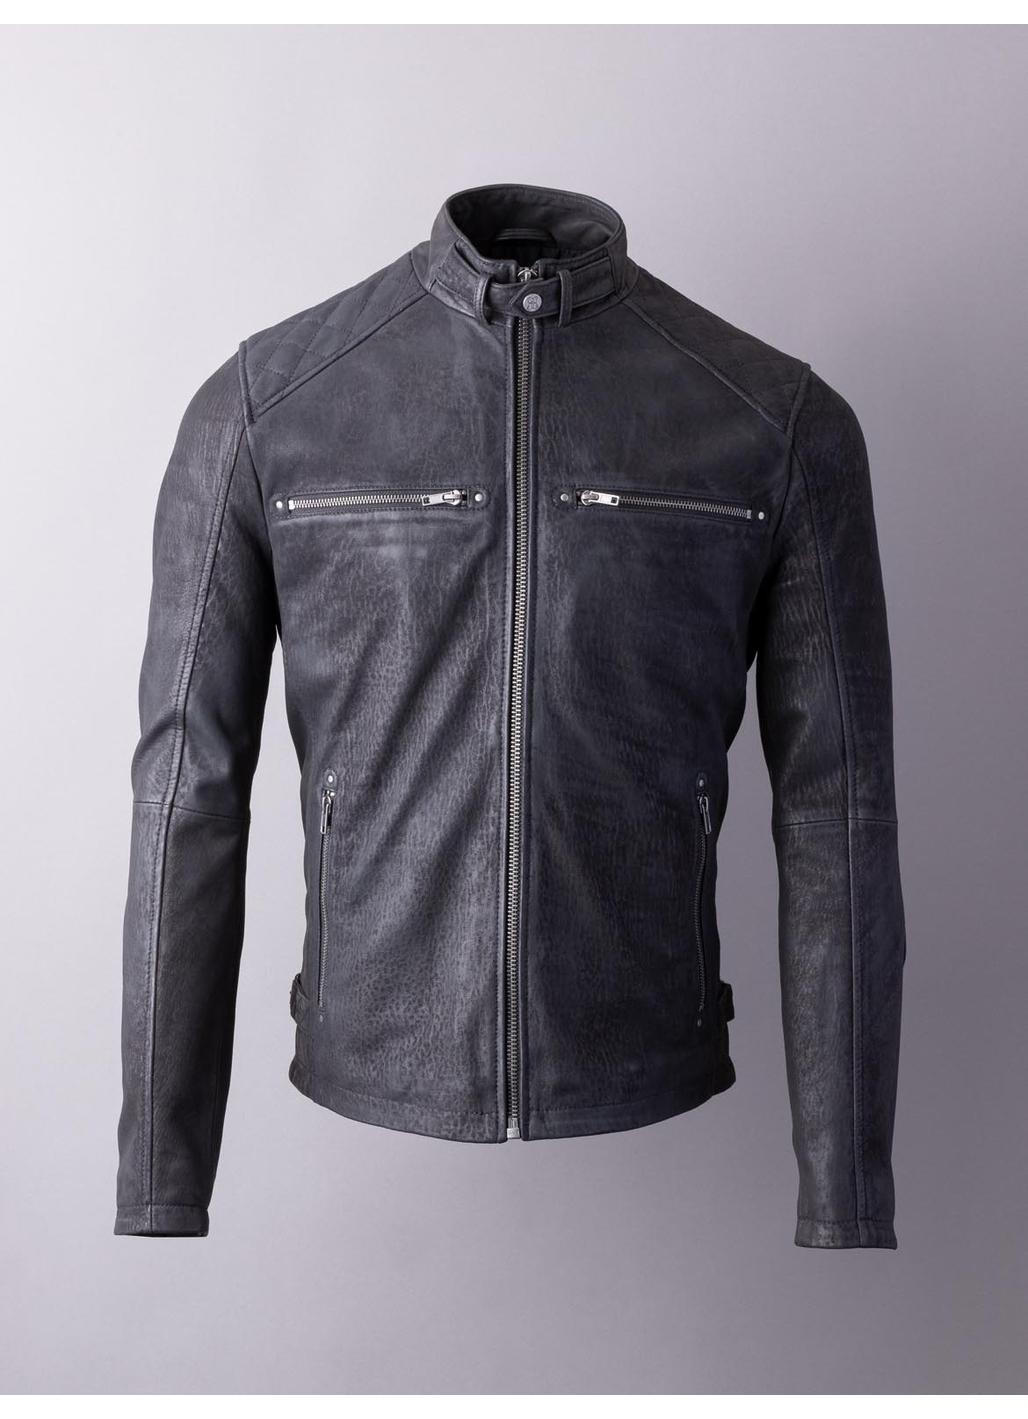 Hamish Leather Jacket in Black